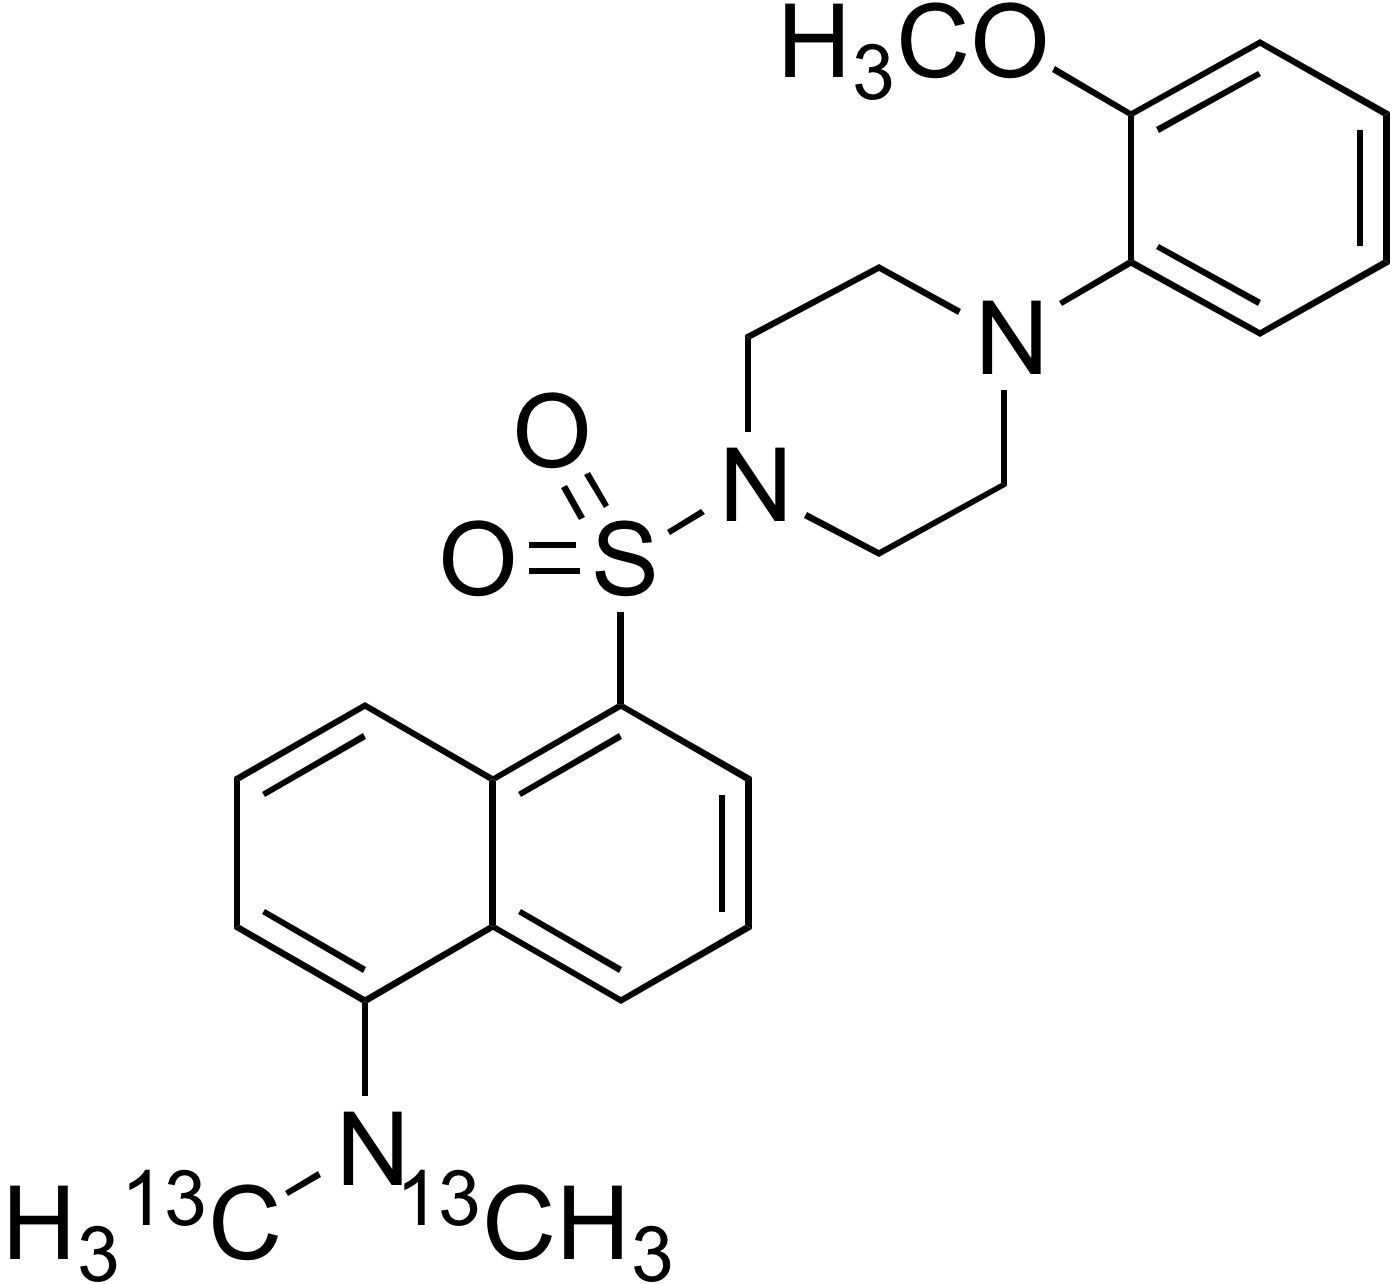 N-Dansyl-<sup>13</sup>C<sub>2</sub>-1-(2-methoxyphenyl)piperazine